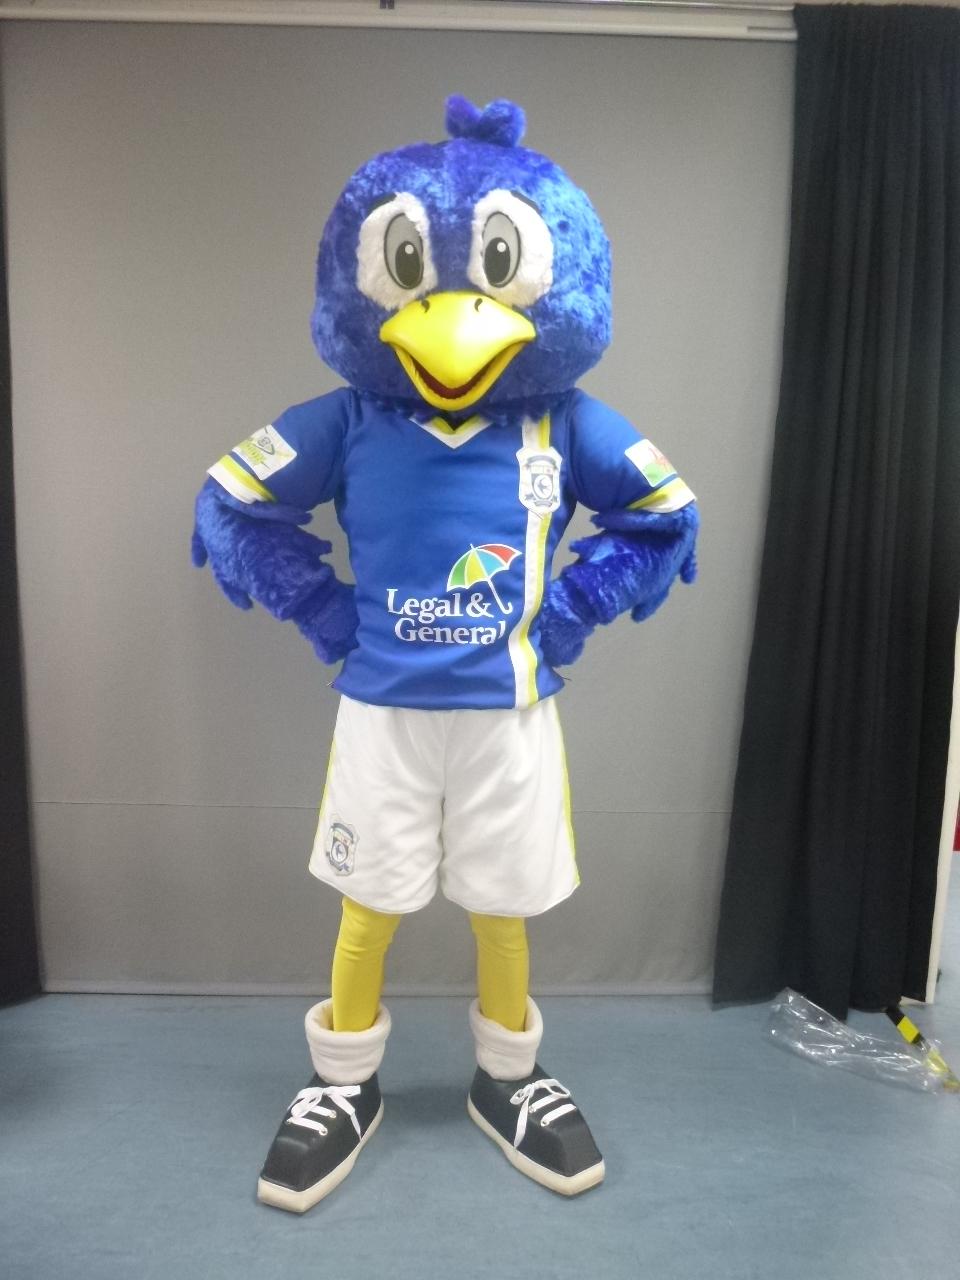 Cardiff Bluebird